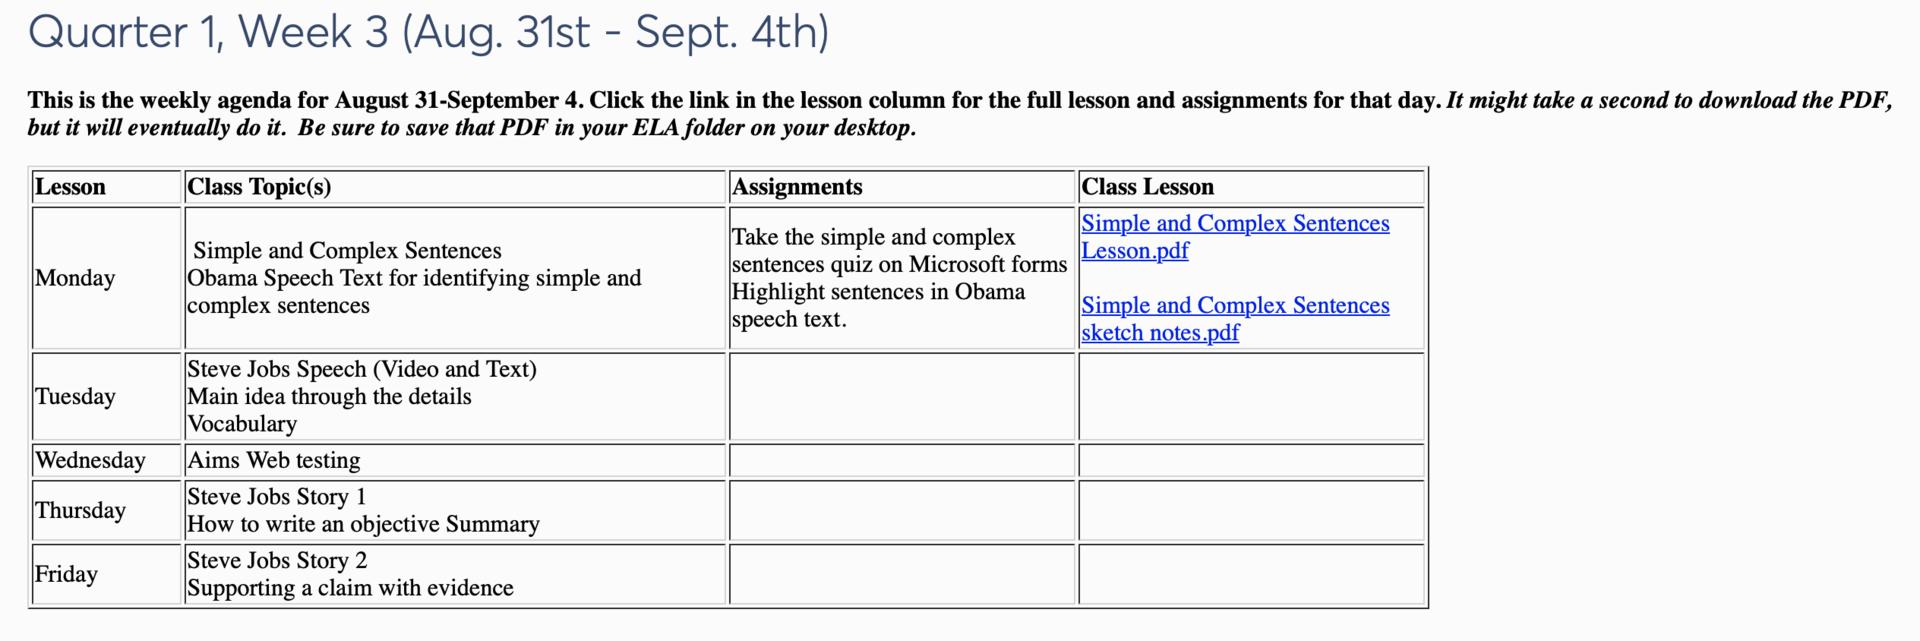 Weekly Agenda - Katrina Woods - Elmore Park Middle School